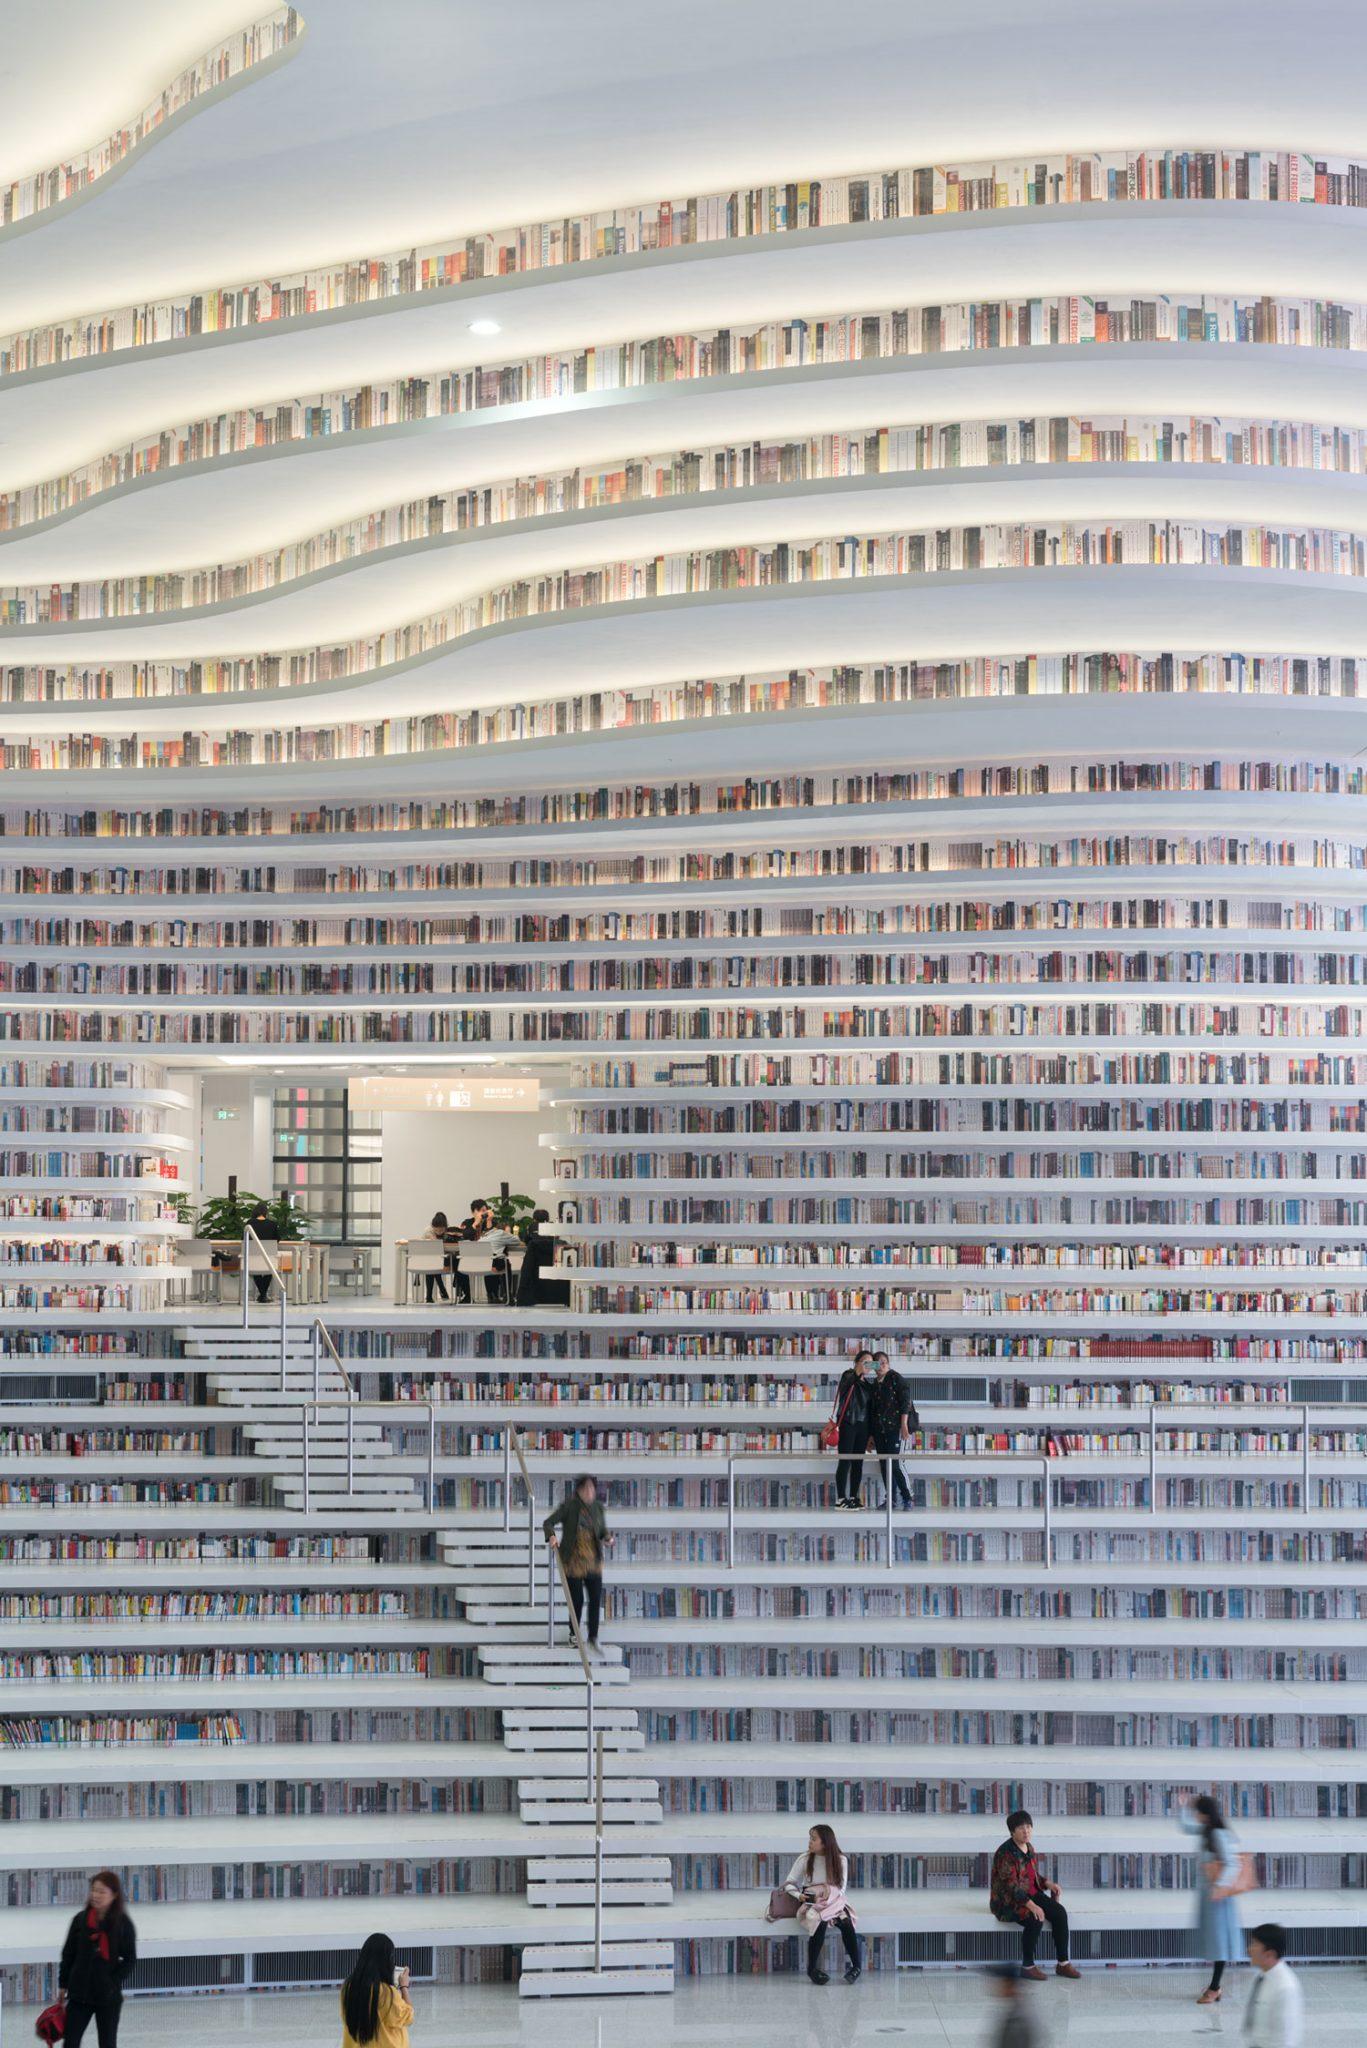 Greenbuilding magazine, MVRDV, Tianjin Binhai Library, China. Ph. © Ossip van Duivenbode